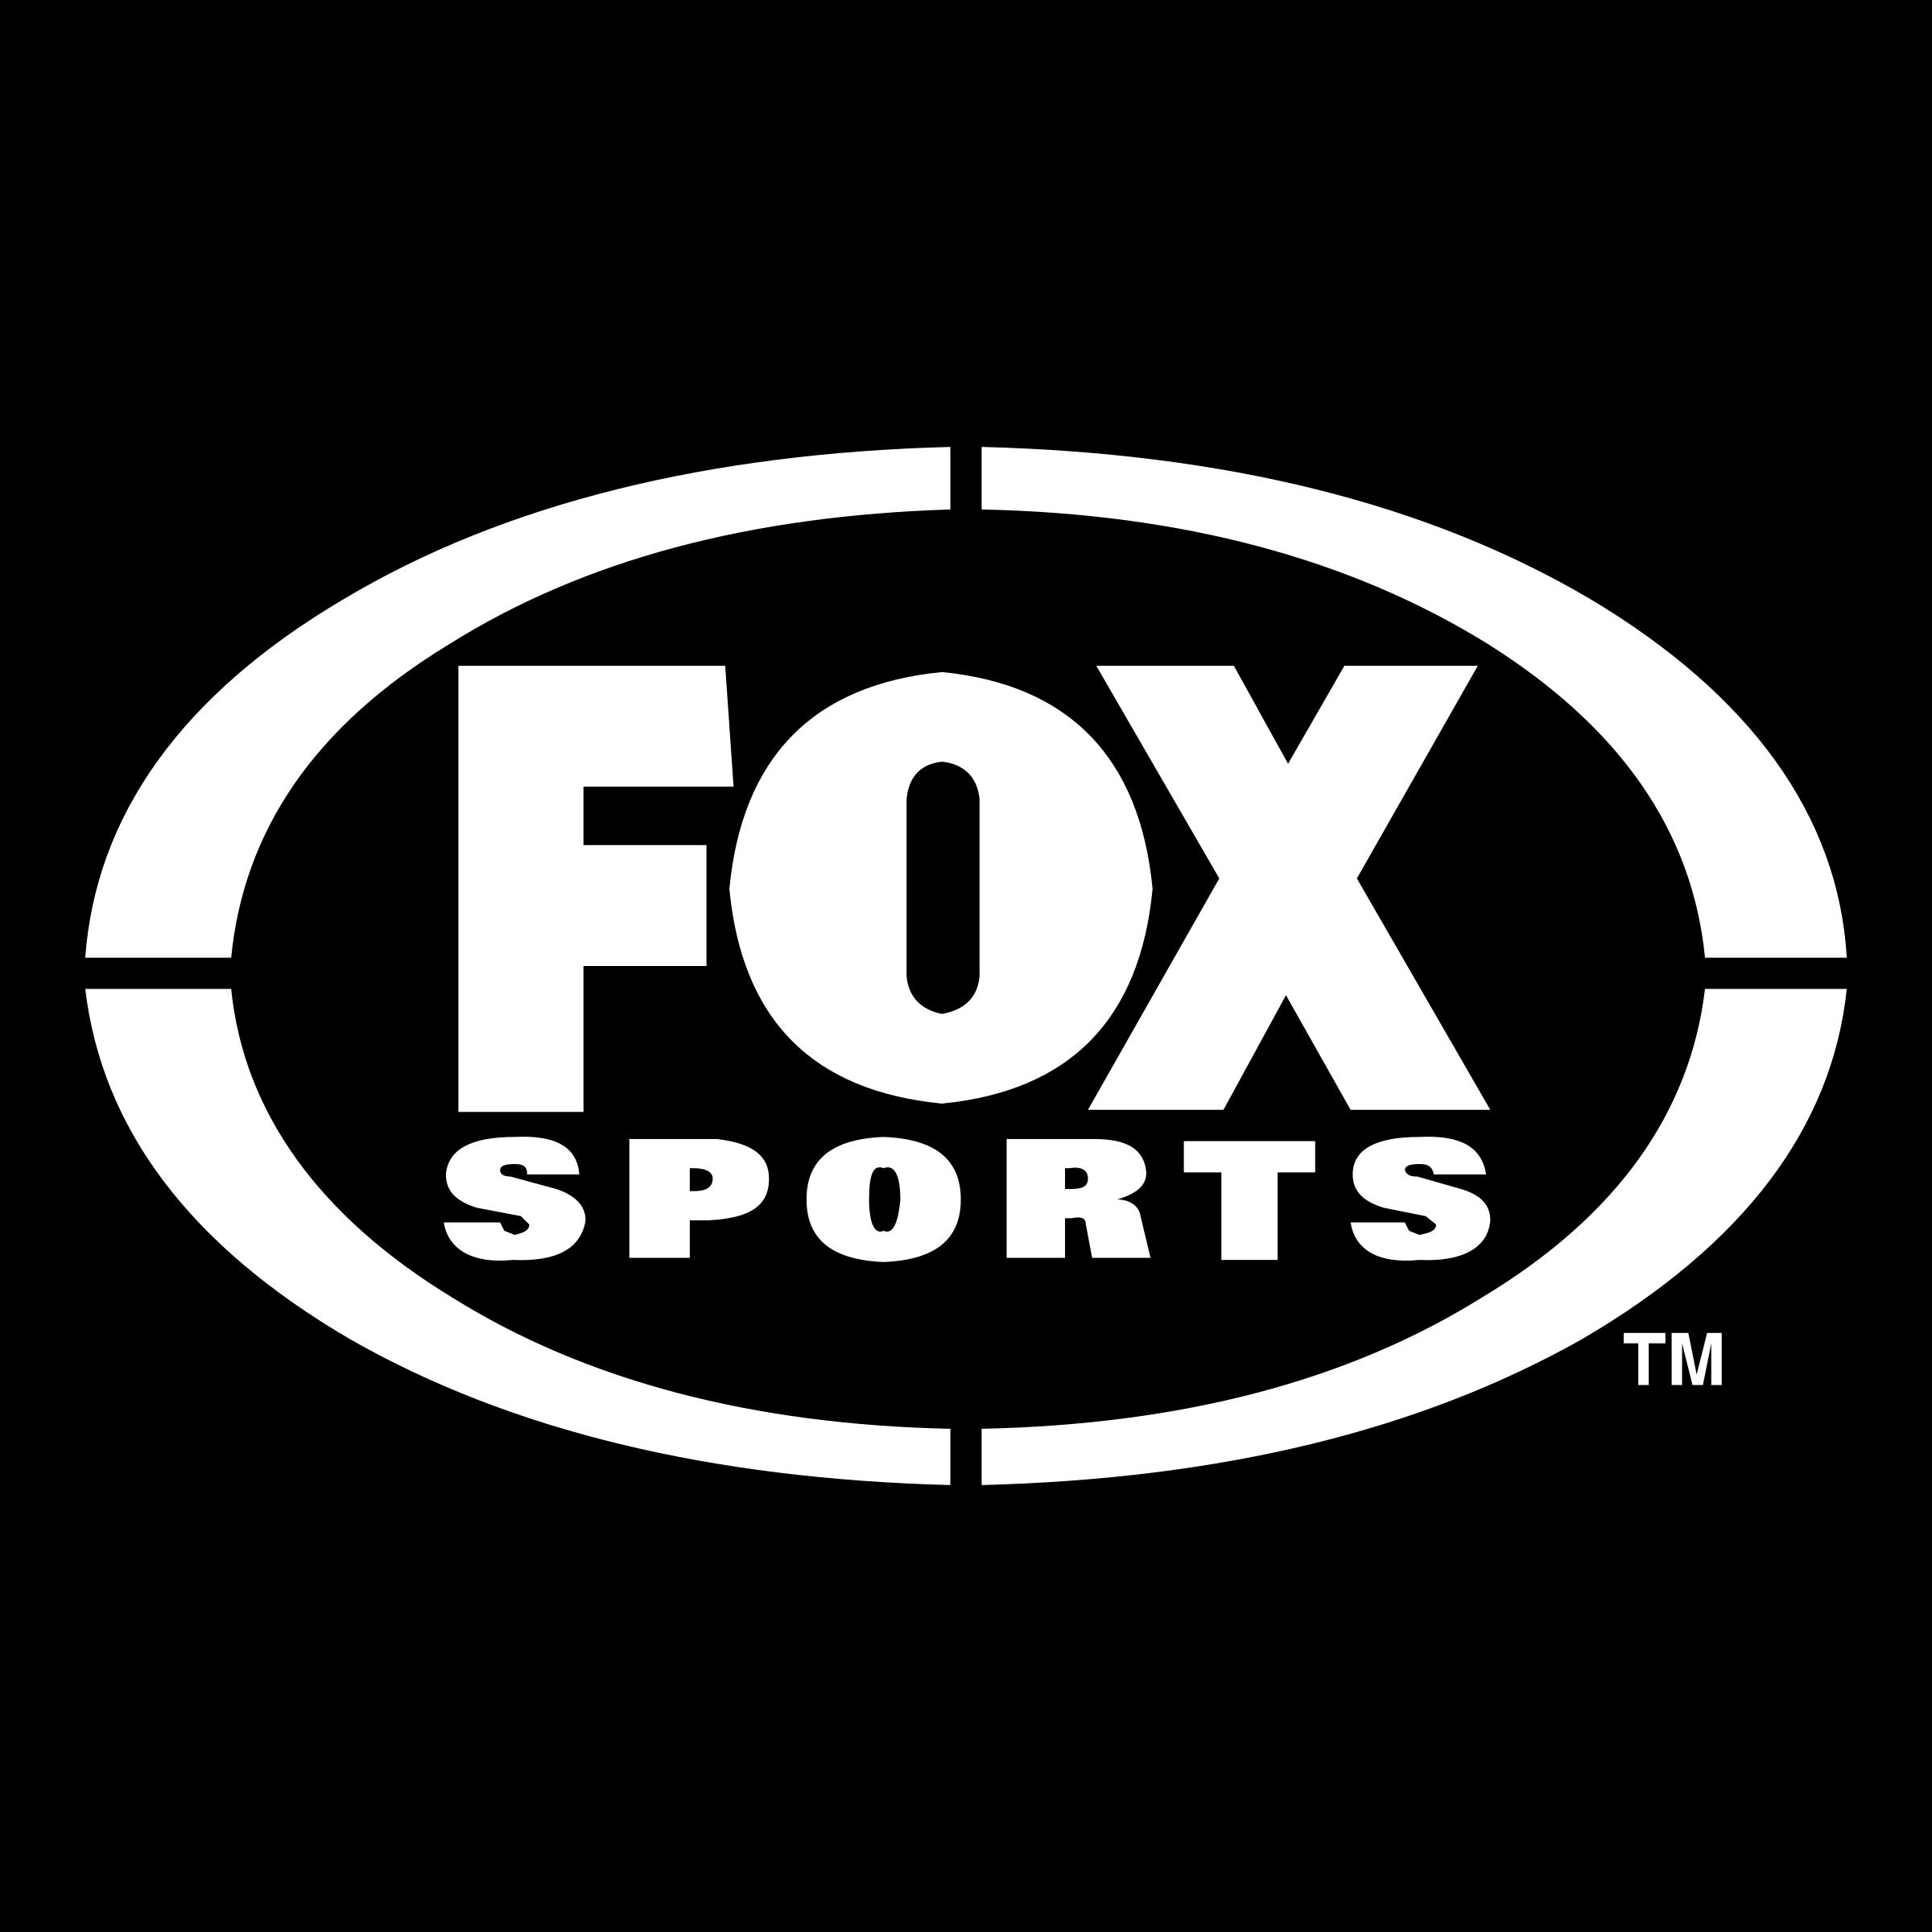 fox-sports-1-logo-png-transparent.png